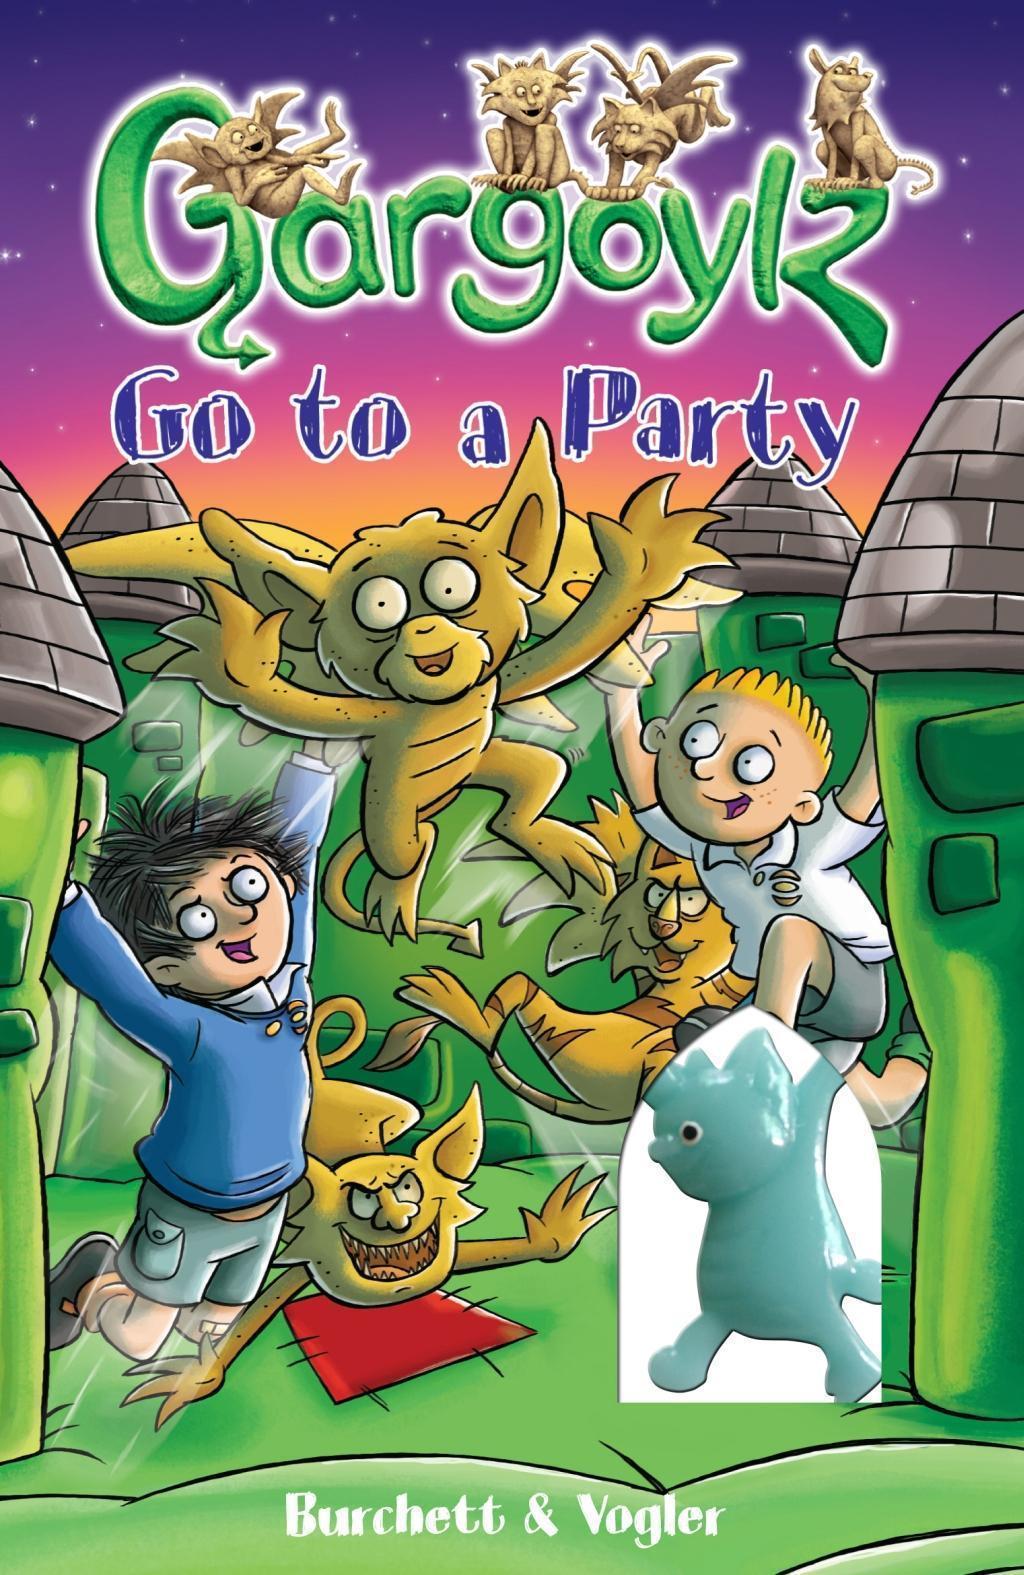 Gargoylz Go to a Party